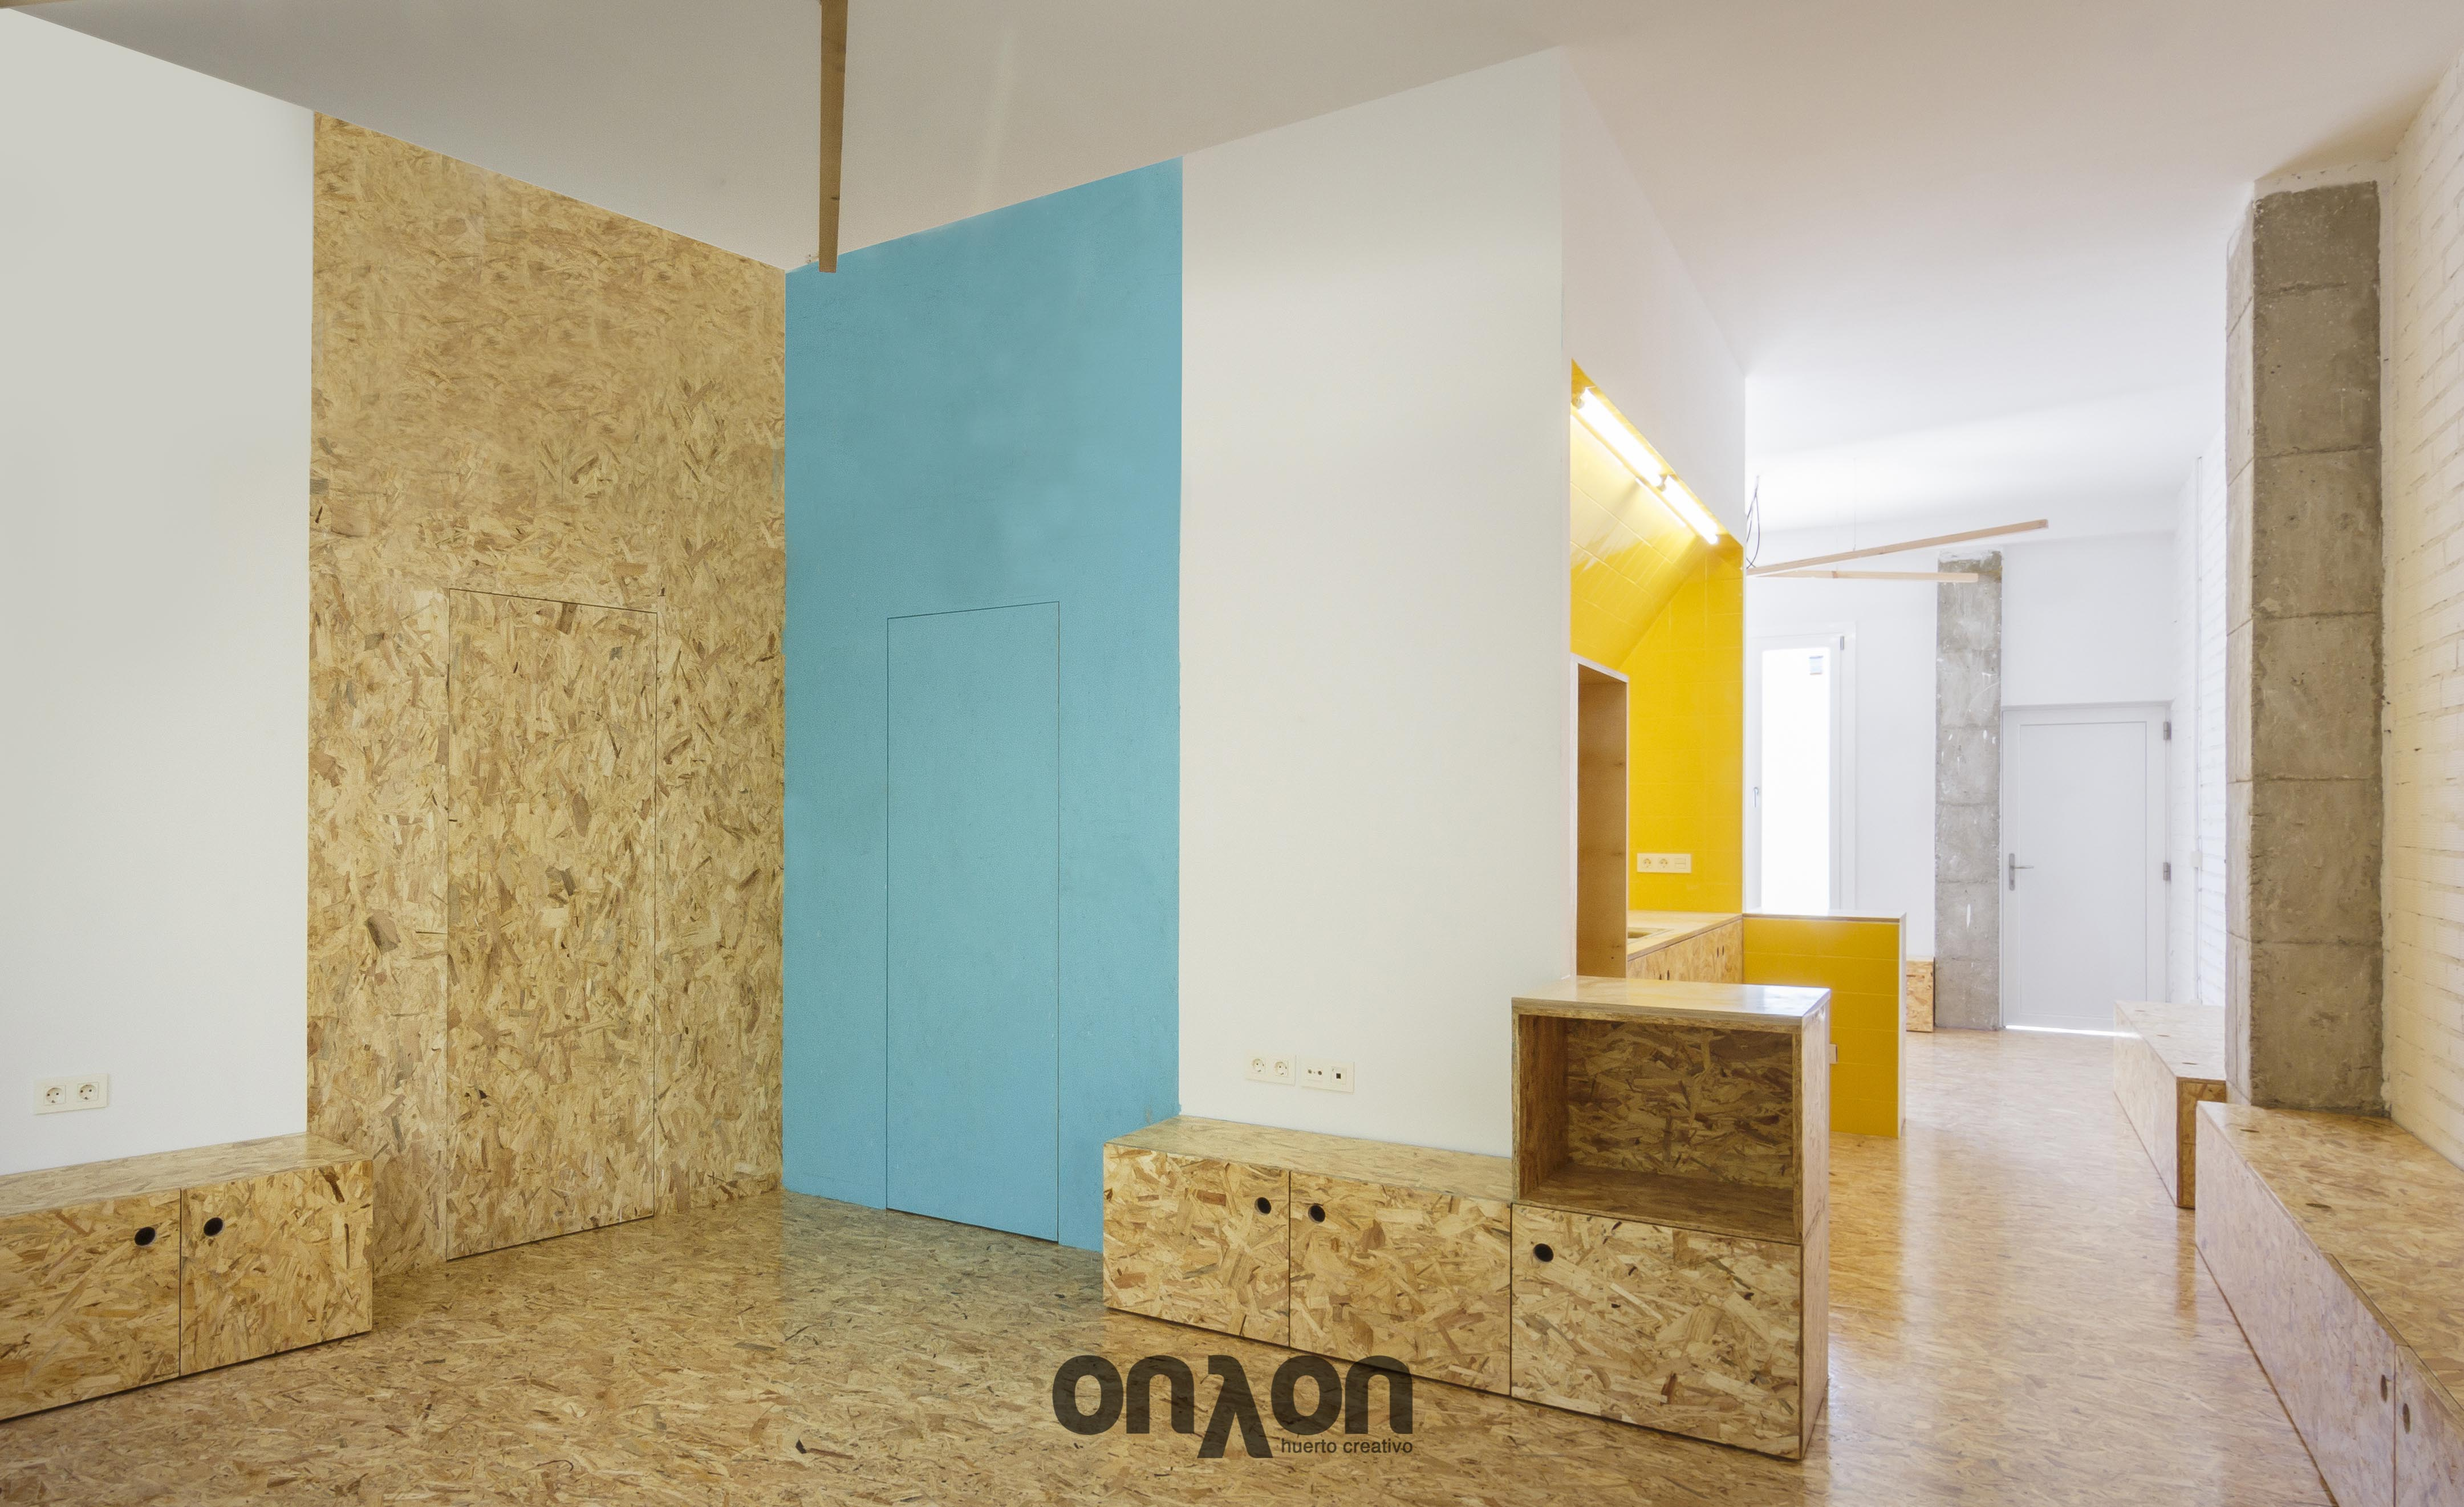 onyon-basarte-baja-sello16